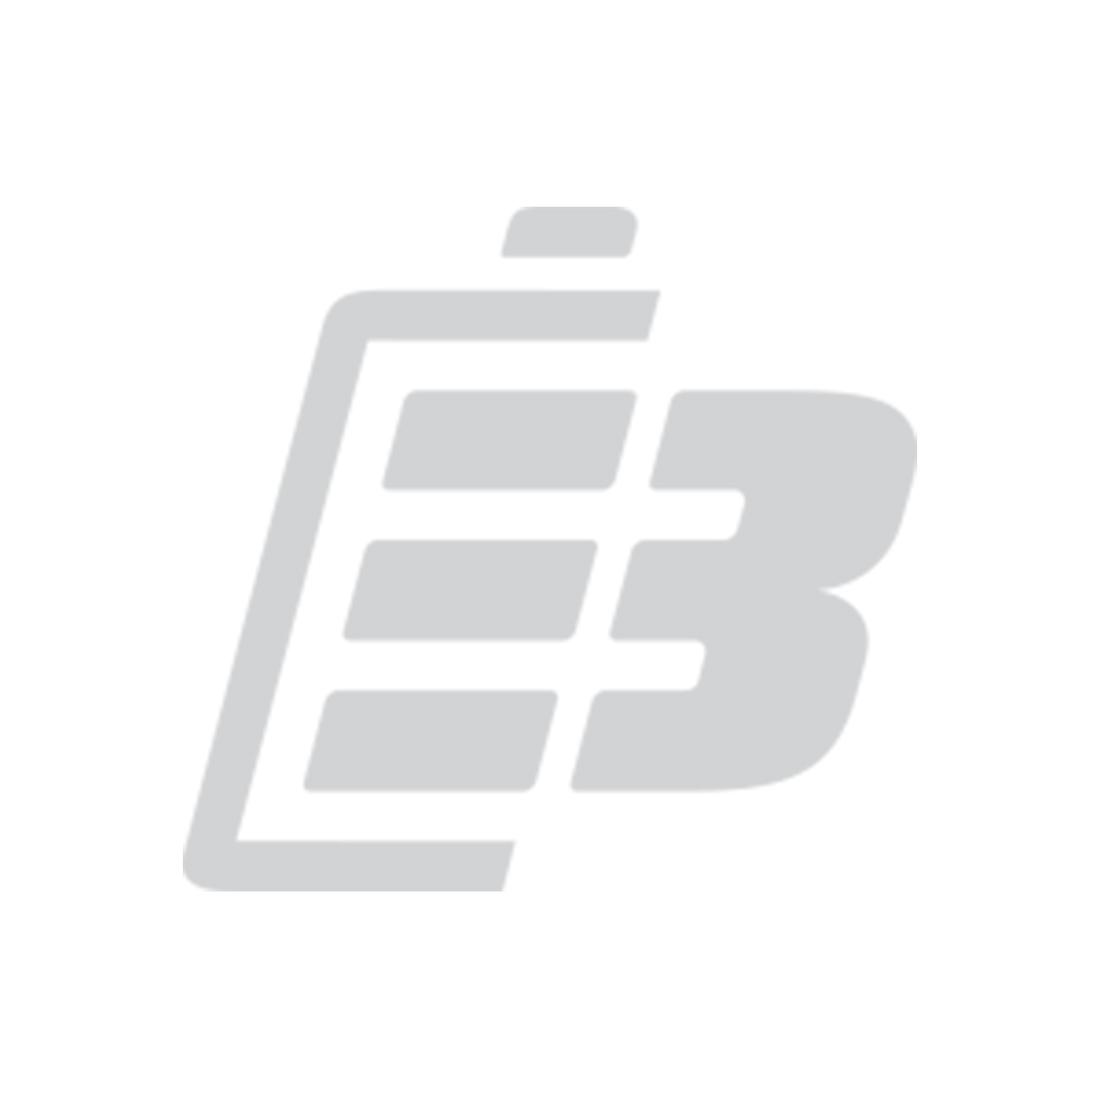 Fenix C7 High  Performance LED Flashlight